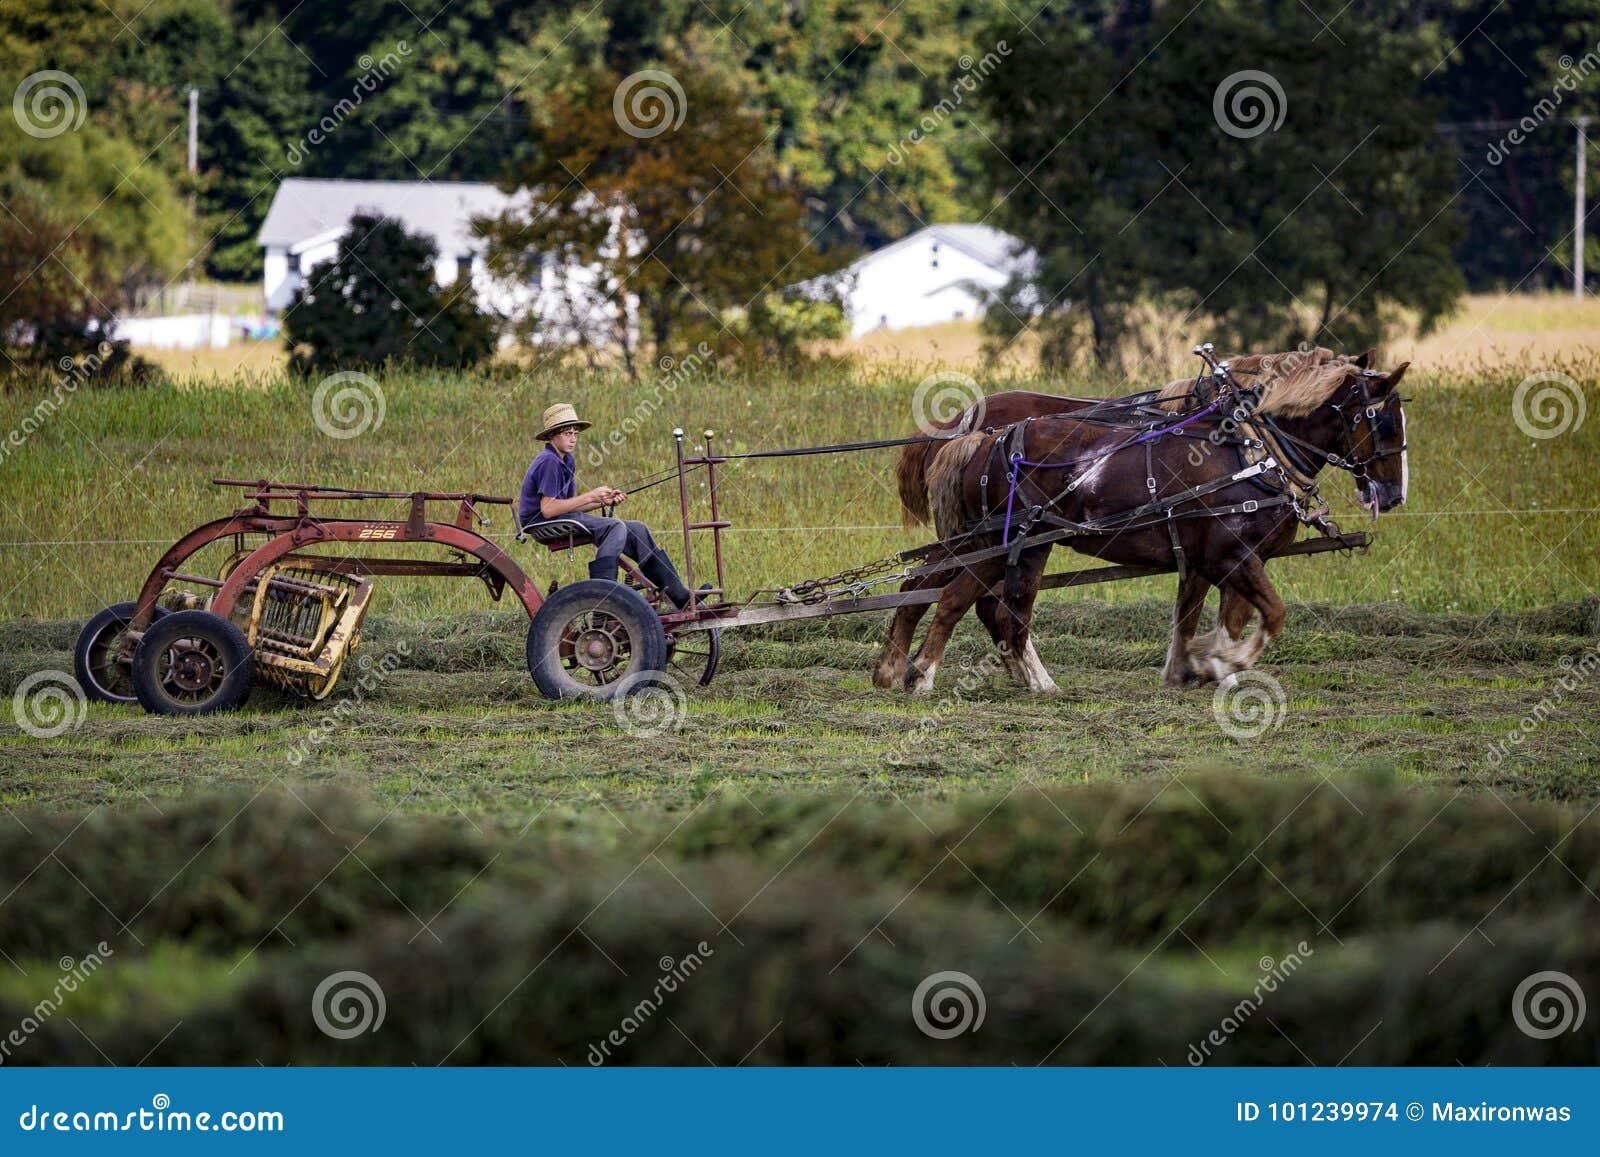 USA - Ohio, Amish -